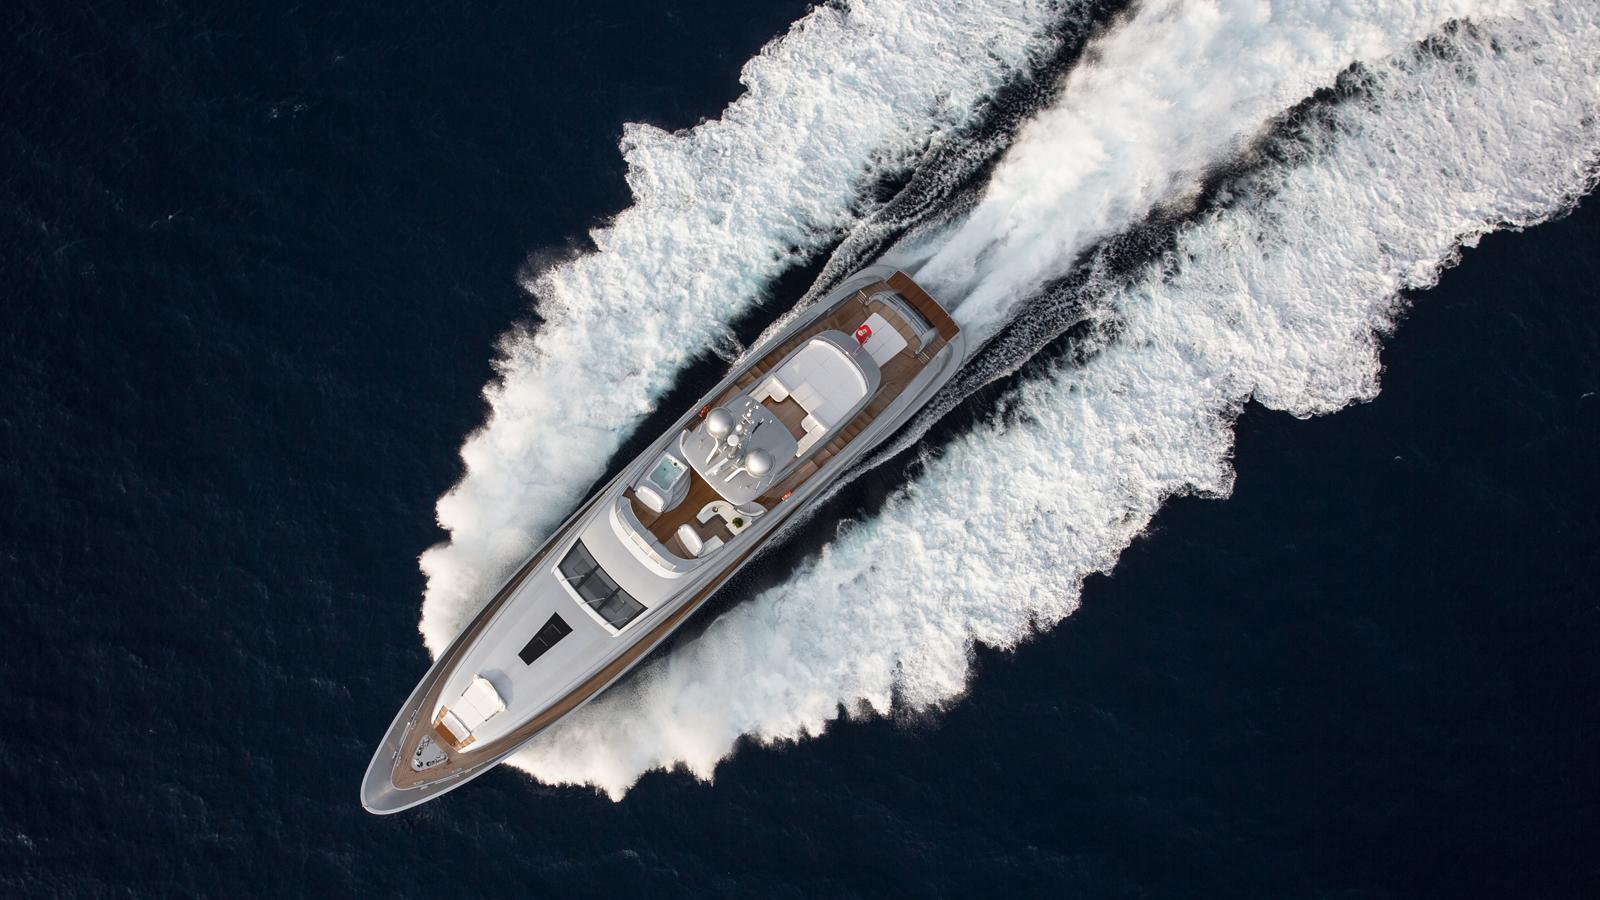 silver-wind-motor-yacht-isa-140-2014-44m-aerial-cruising